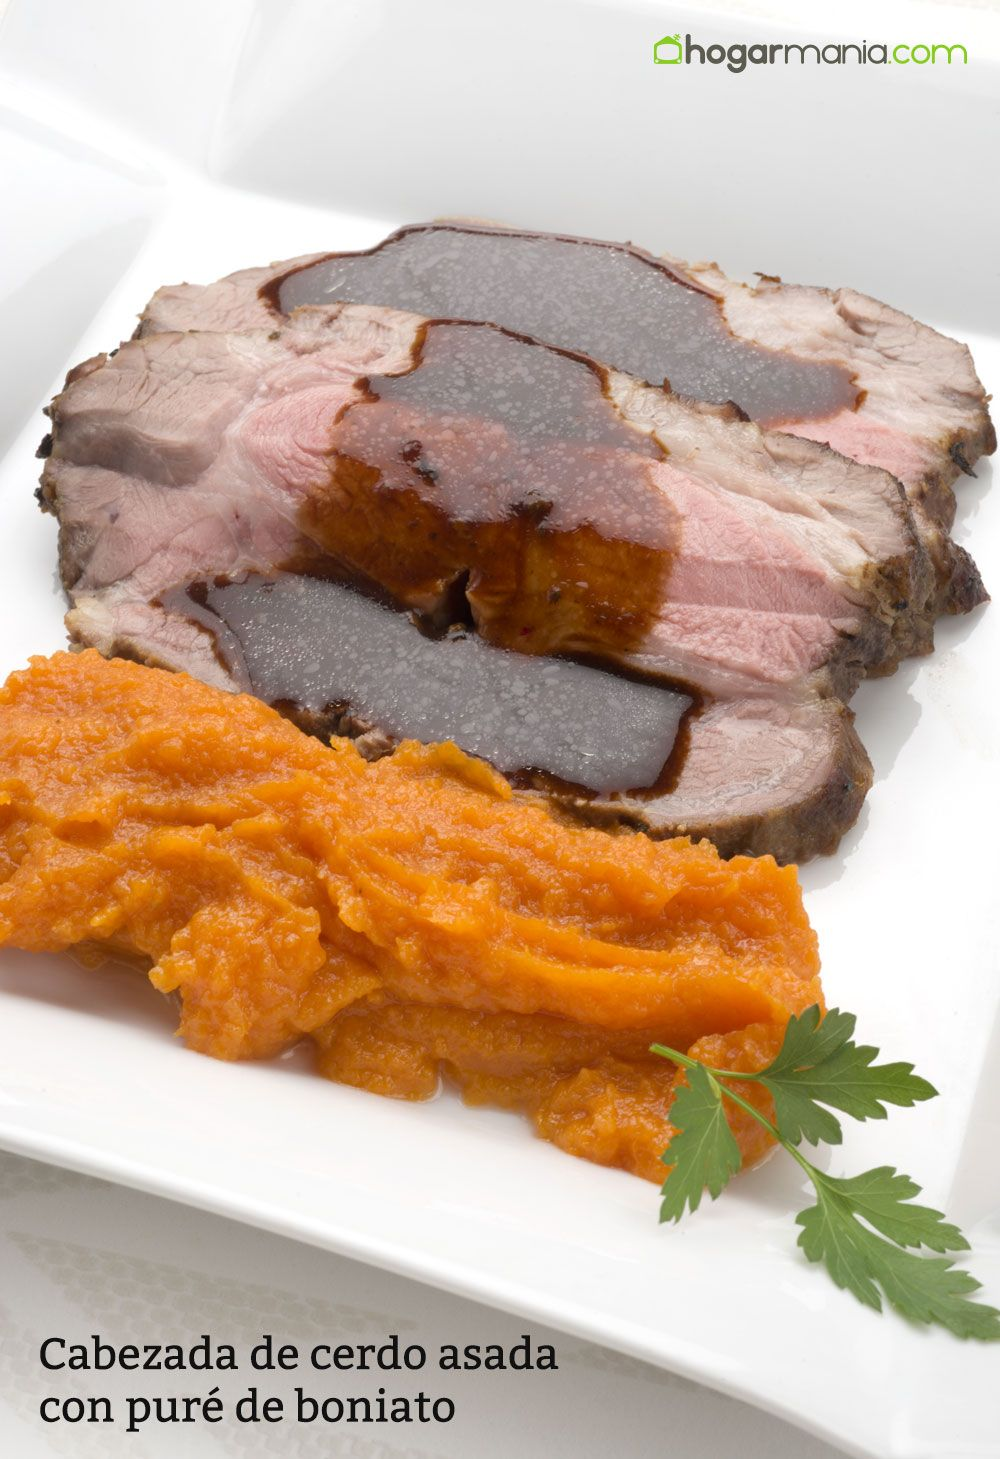 Cabezada de cerdo asado con puré de boniato